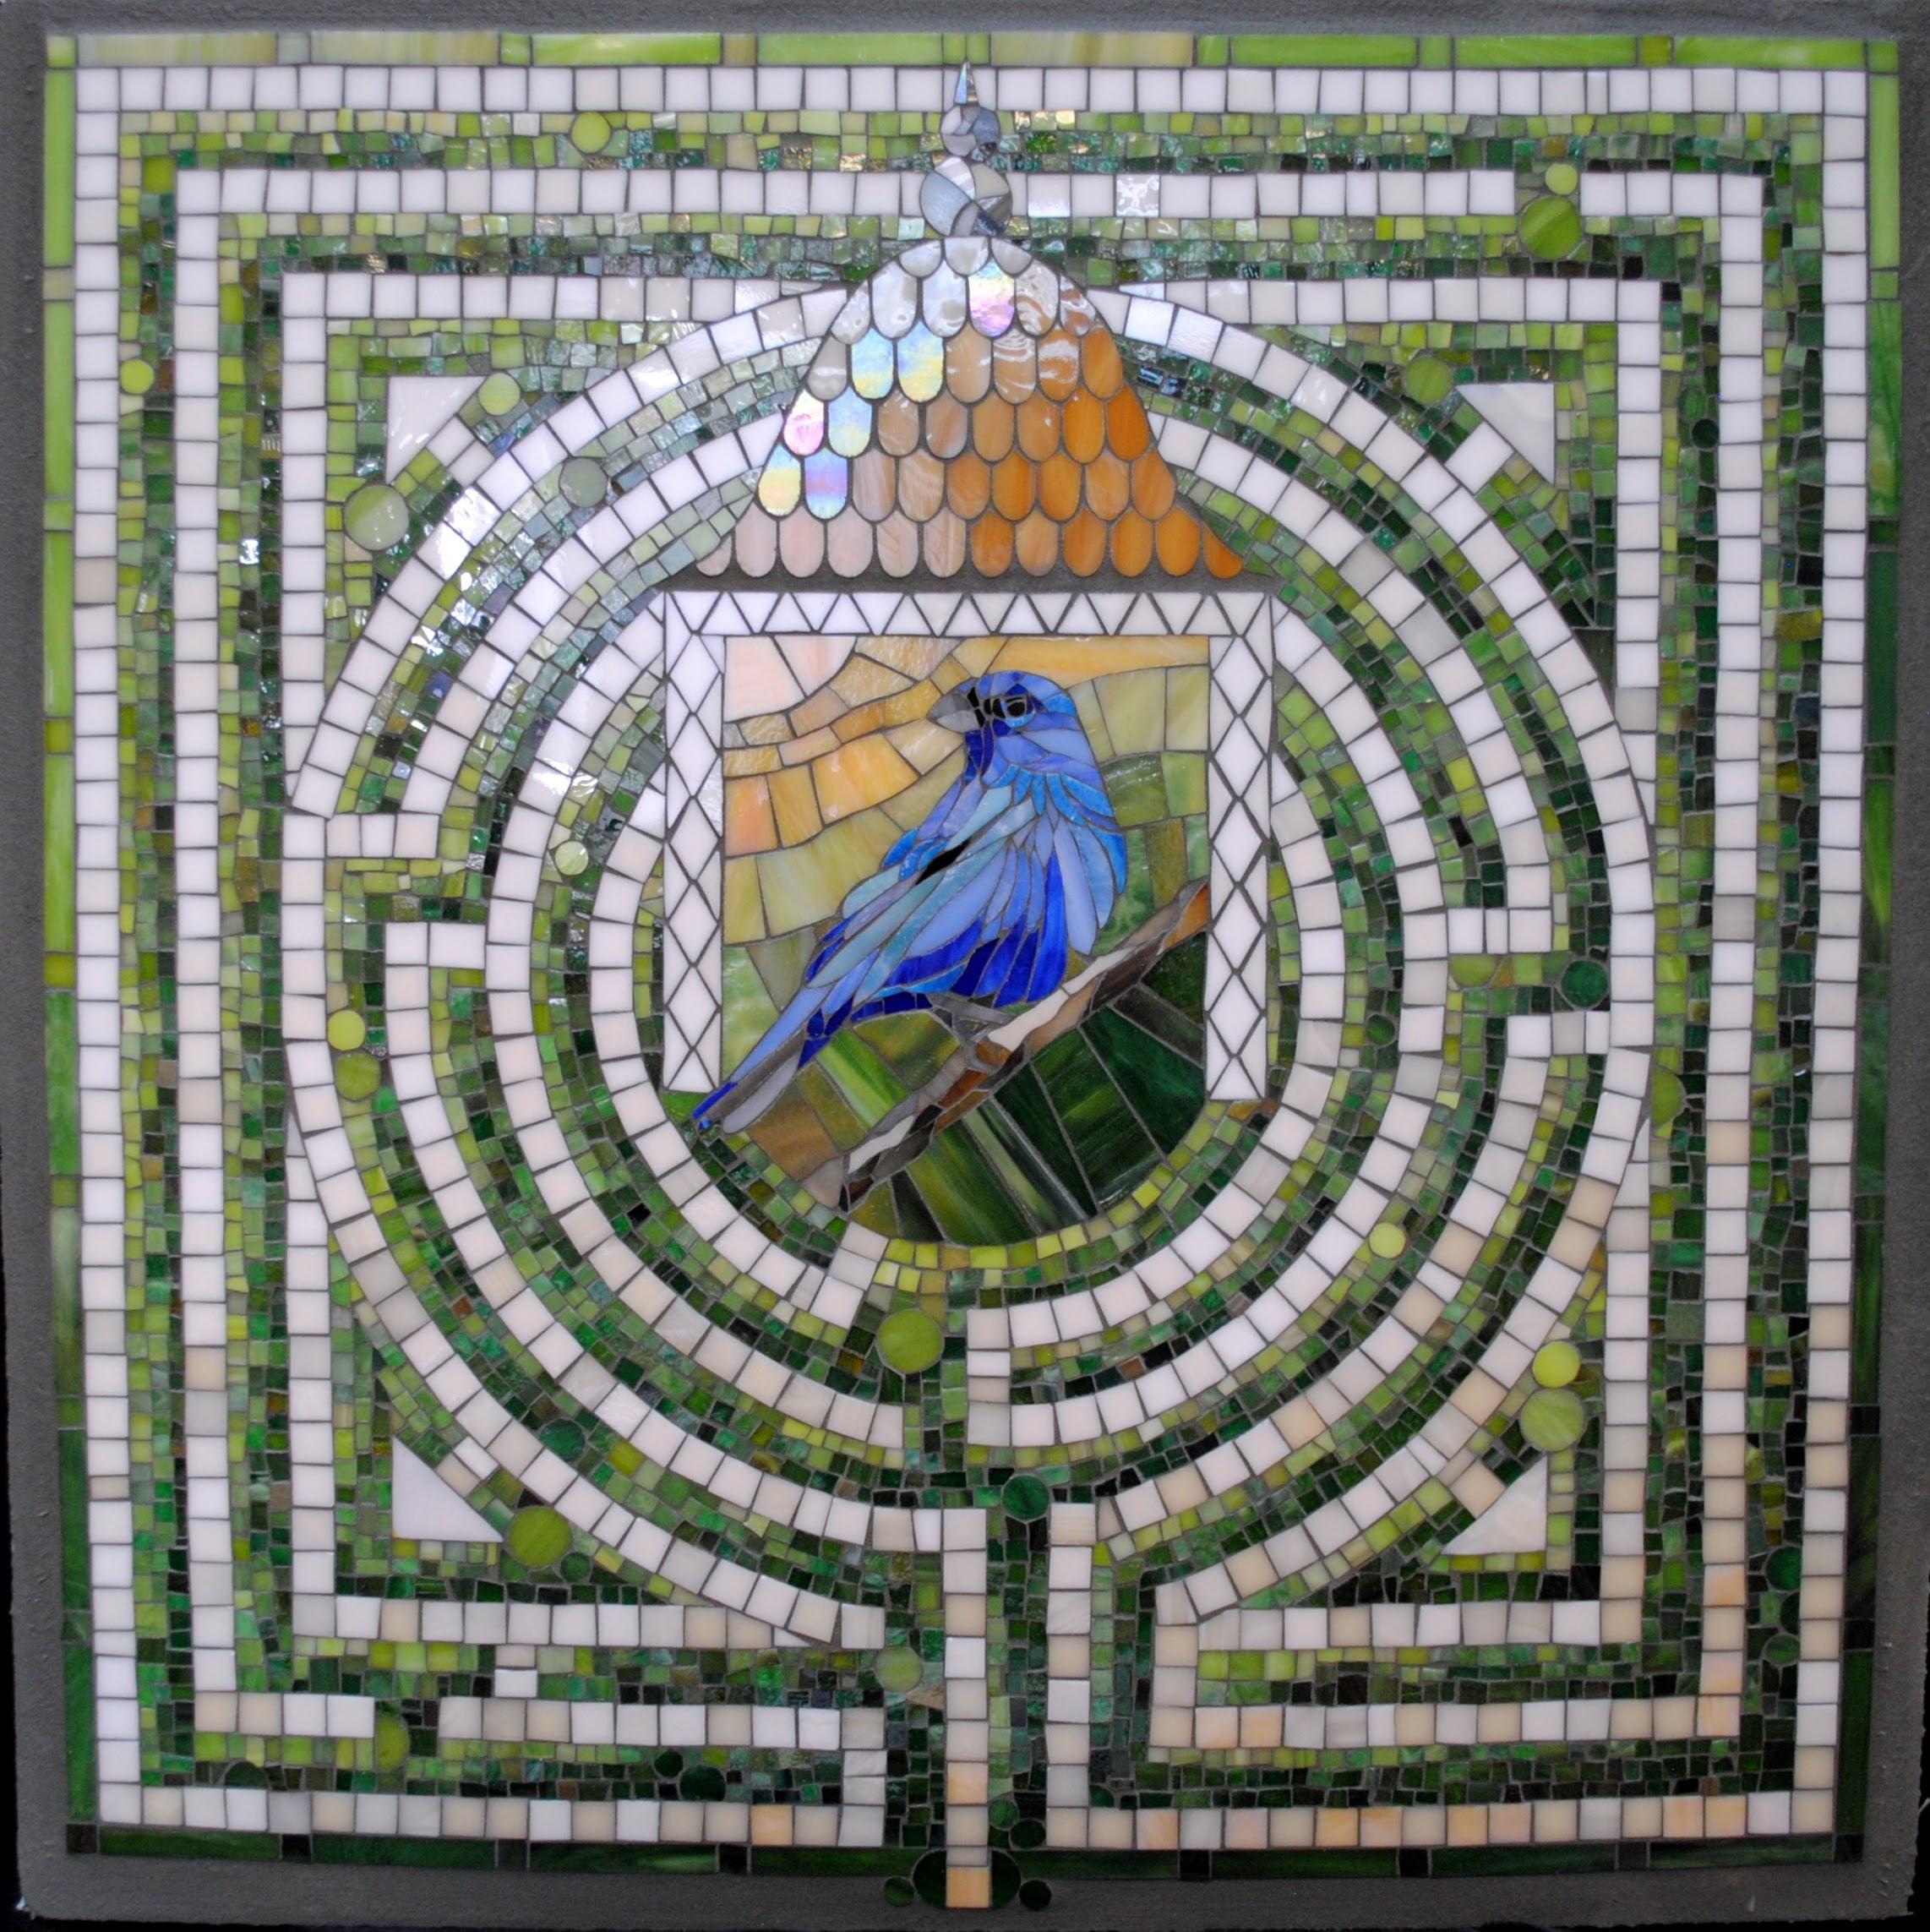 Mosaic Art by Brenda Pokorny